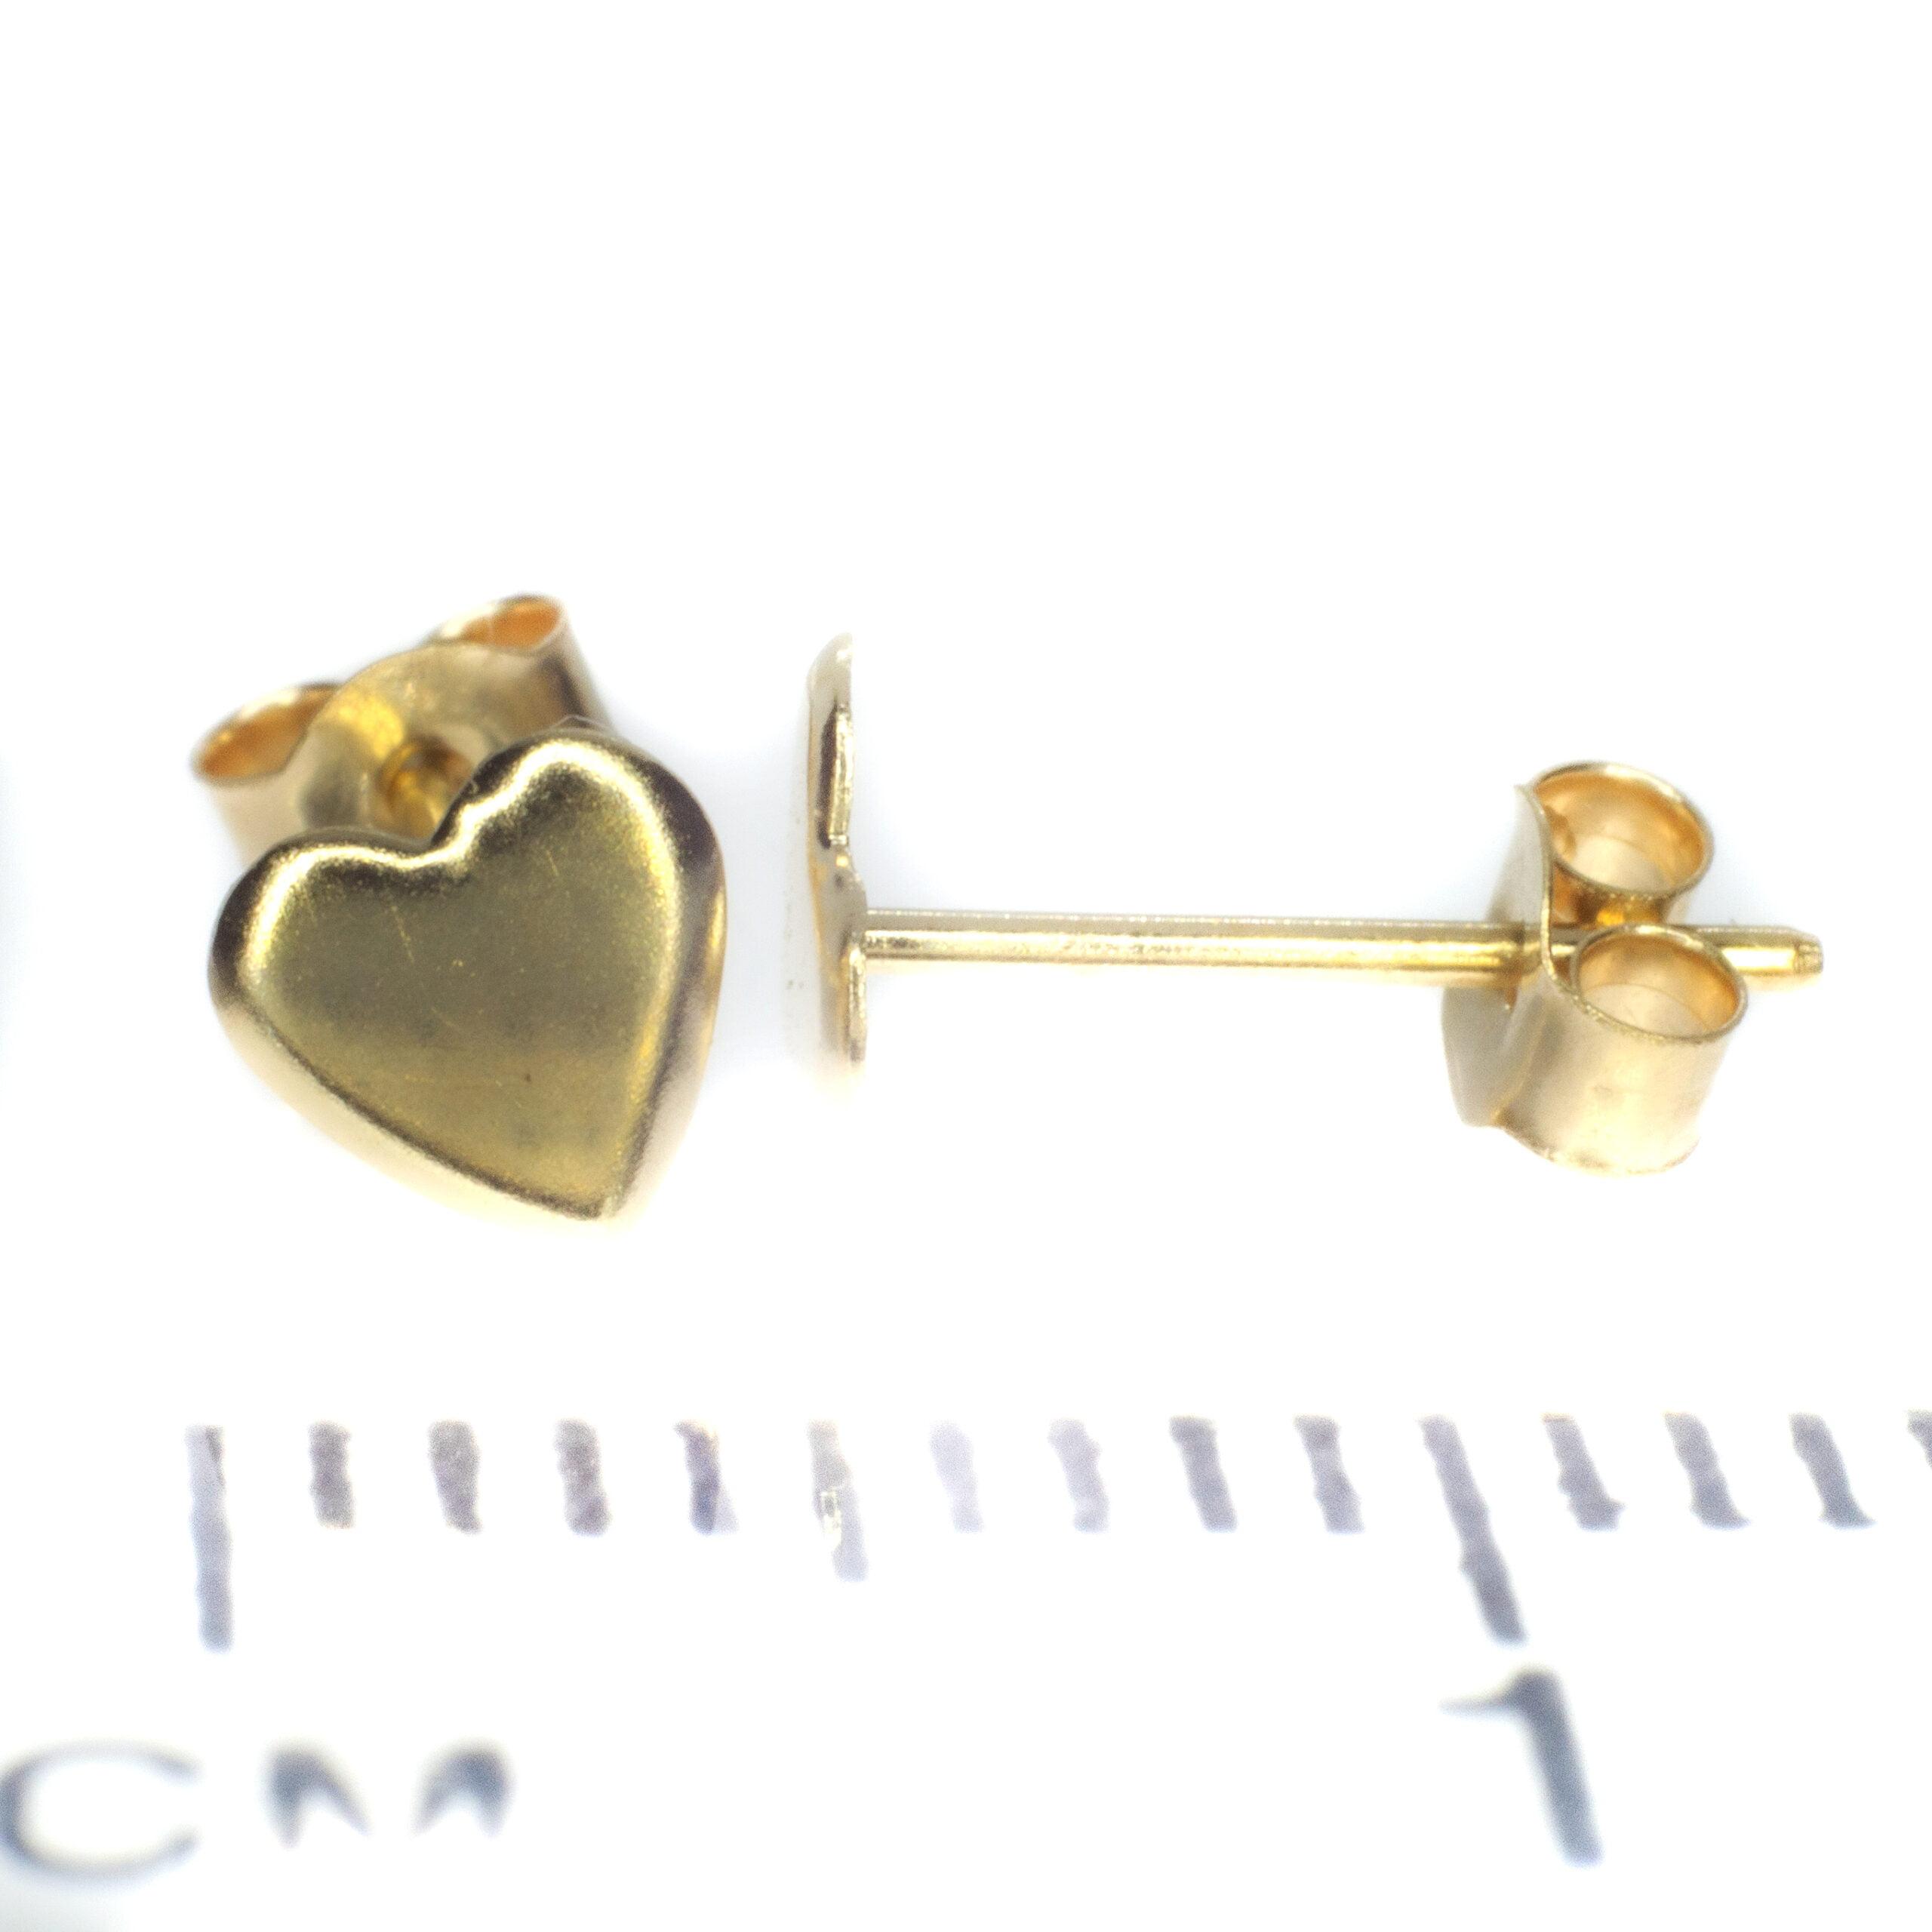 gold heart stud earrings 9ct yellow gold ruler